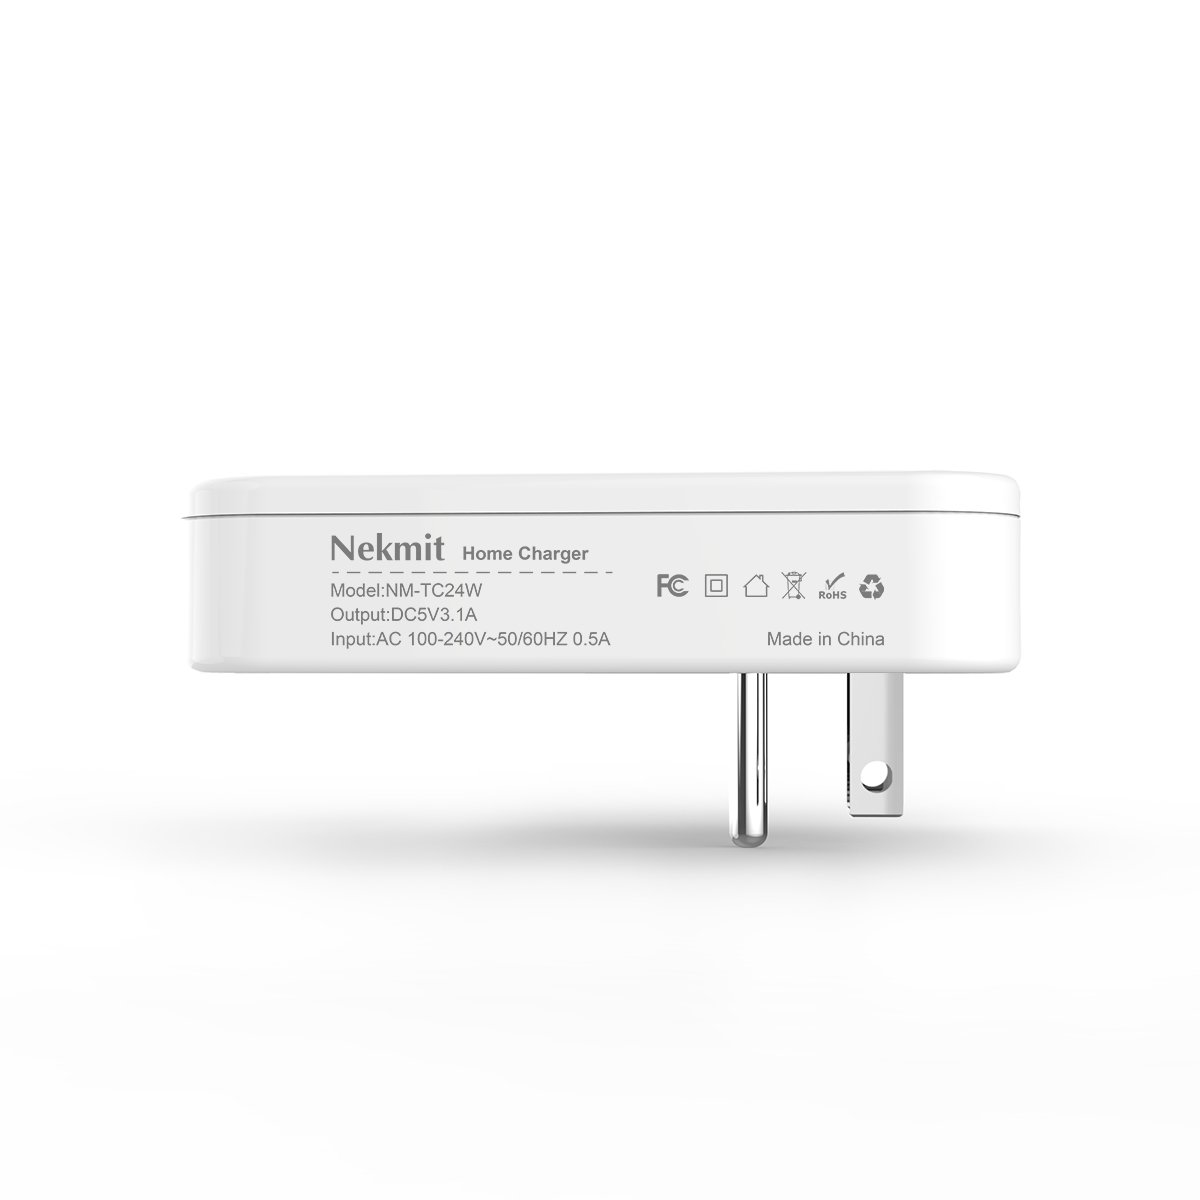 Nekmit Dual Port Ultra Thin Flat USB Wall Charger with Smart IC by Nekmit (Image #5)